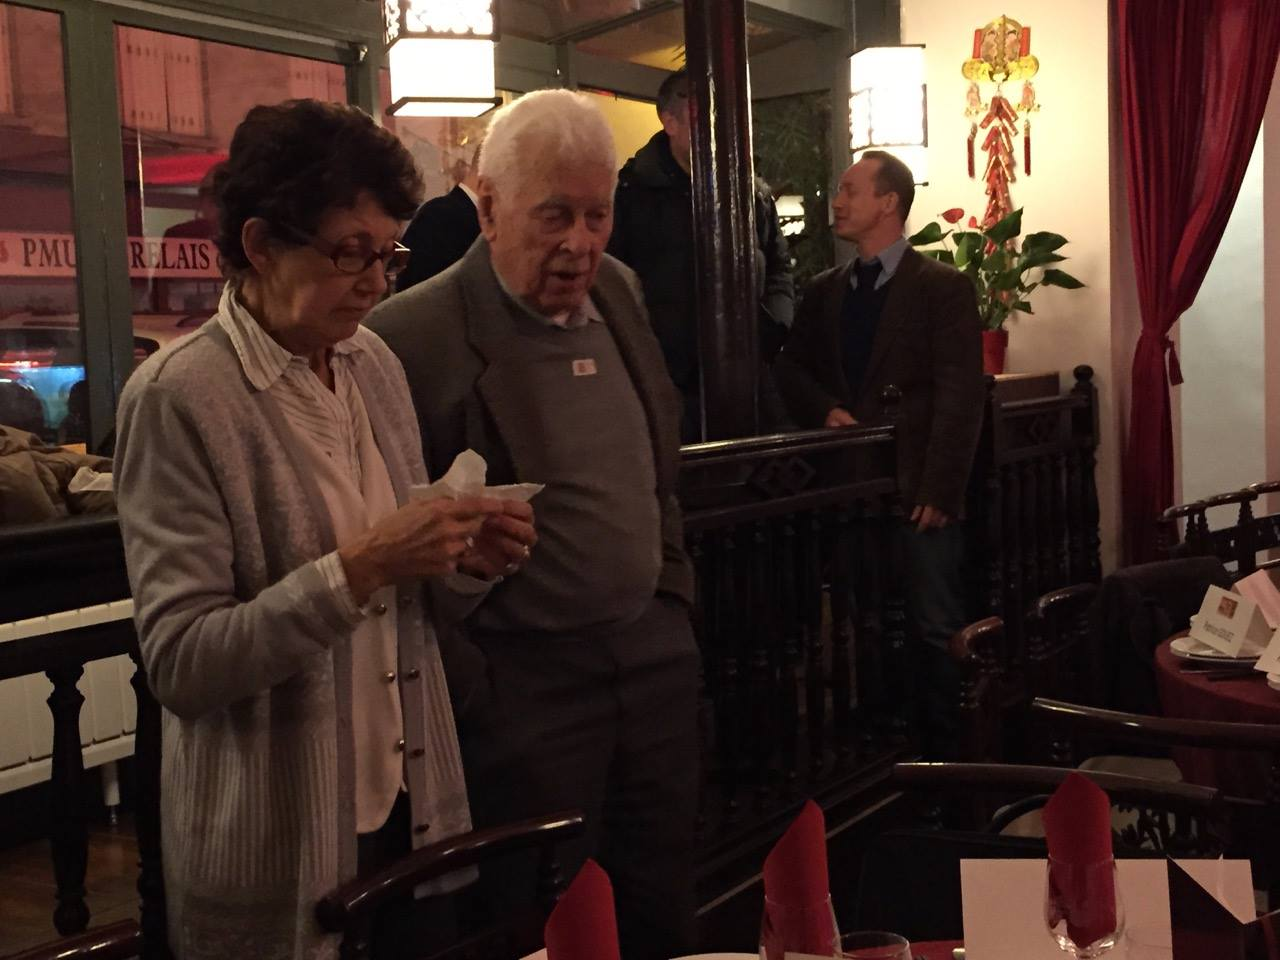 Mr et Mme Greslé